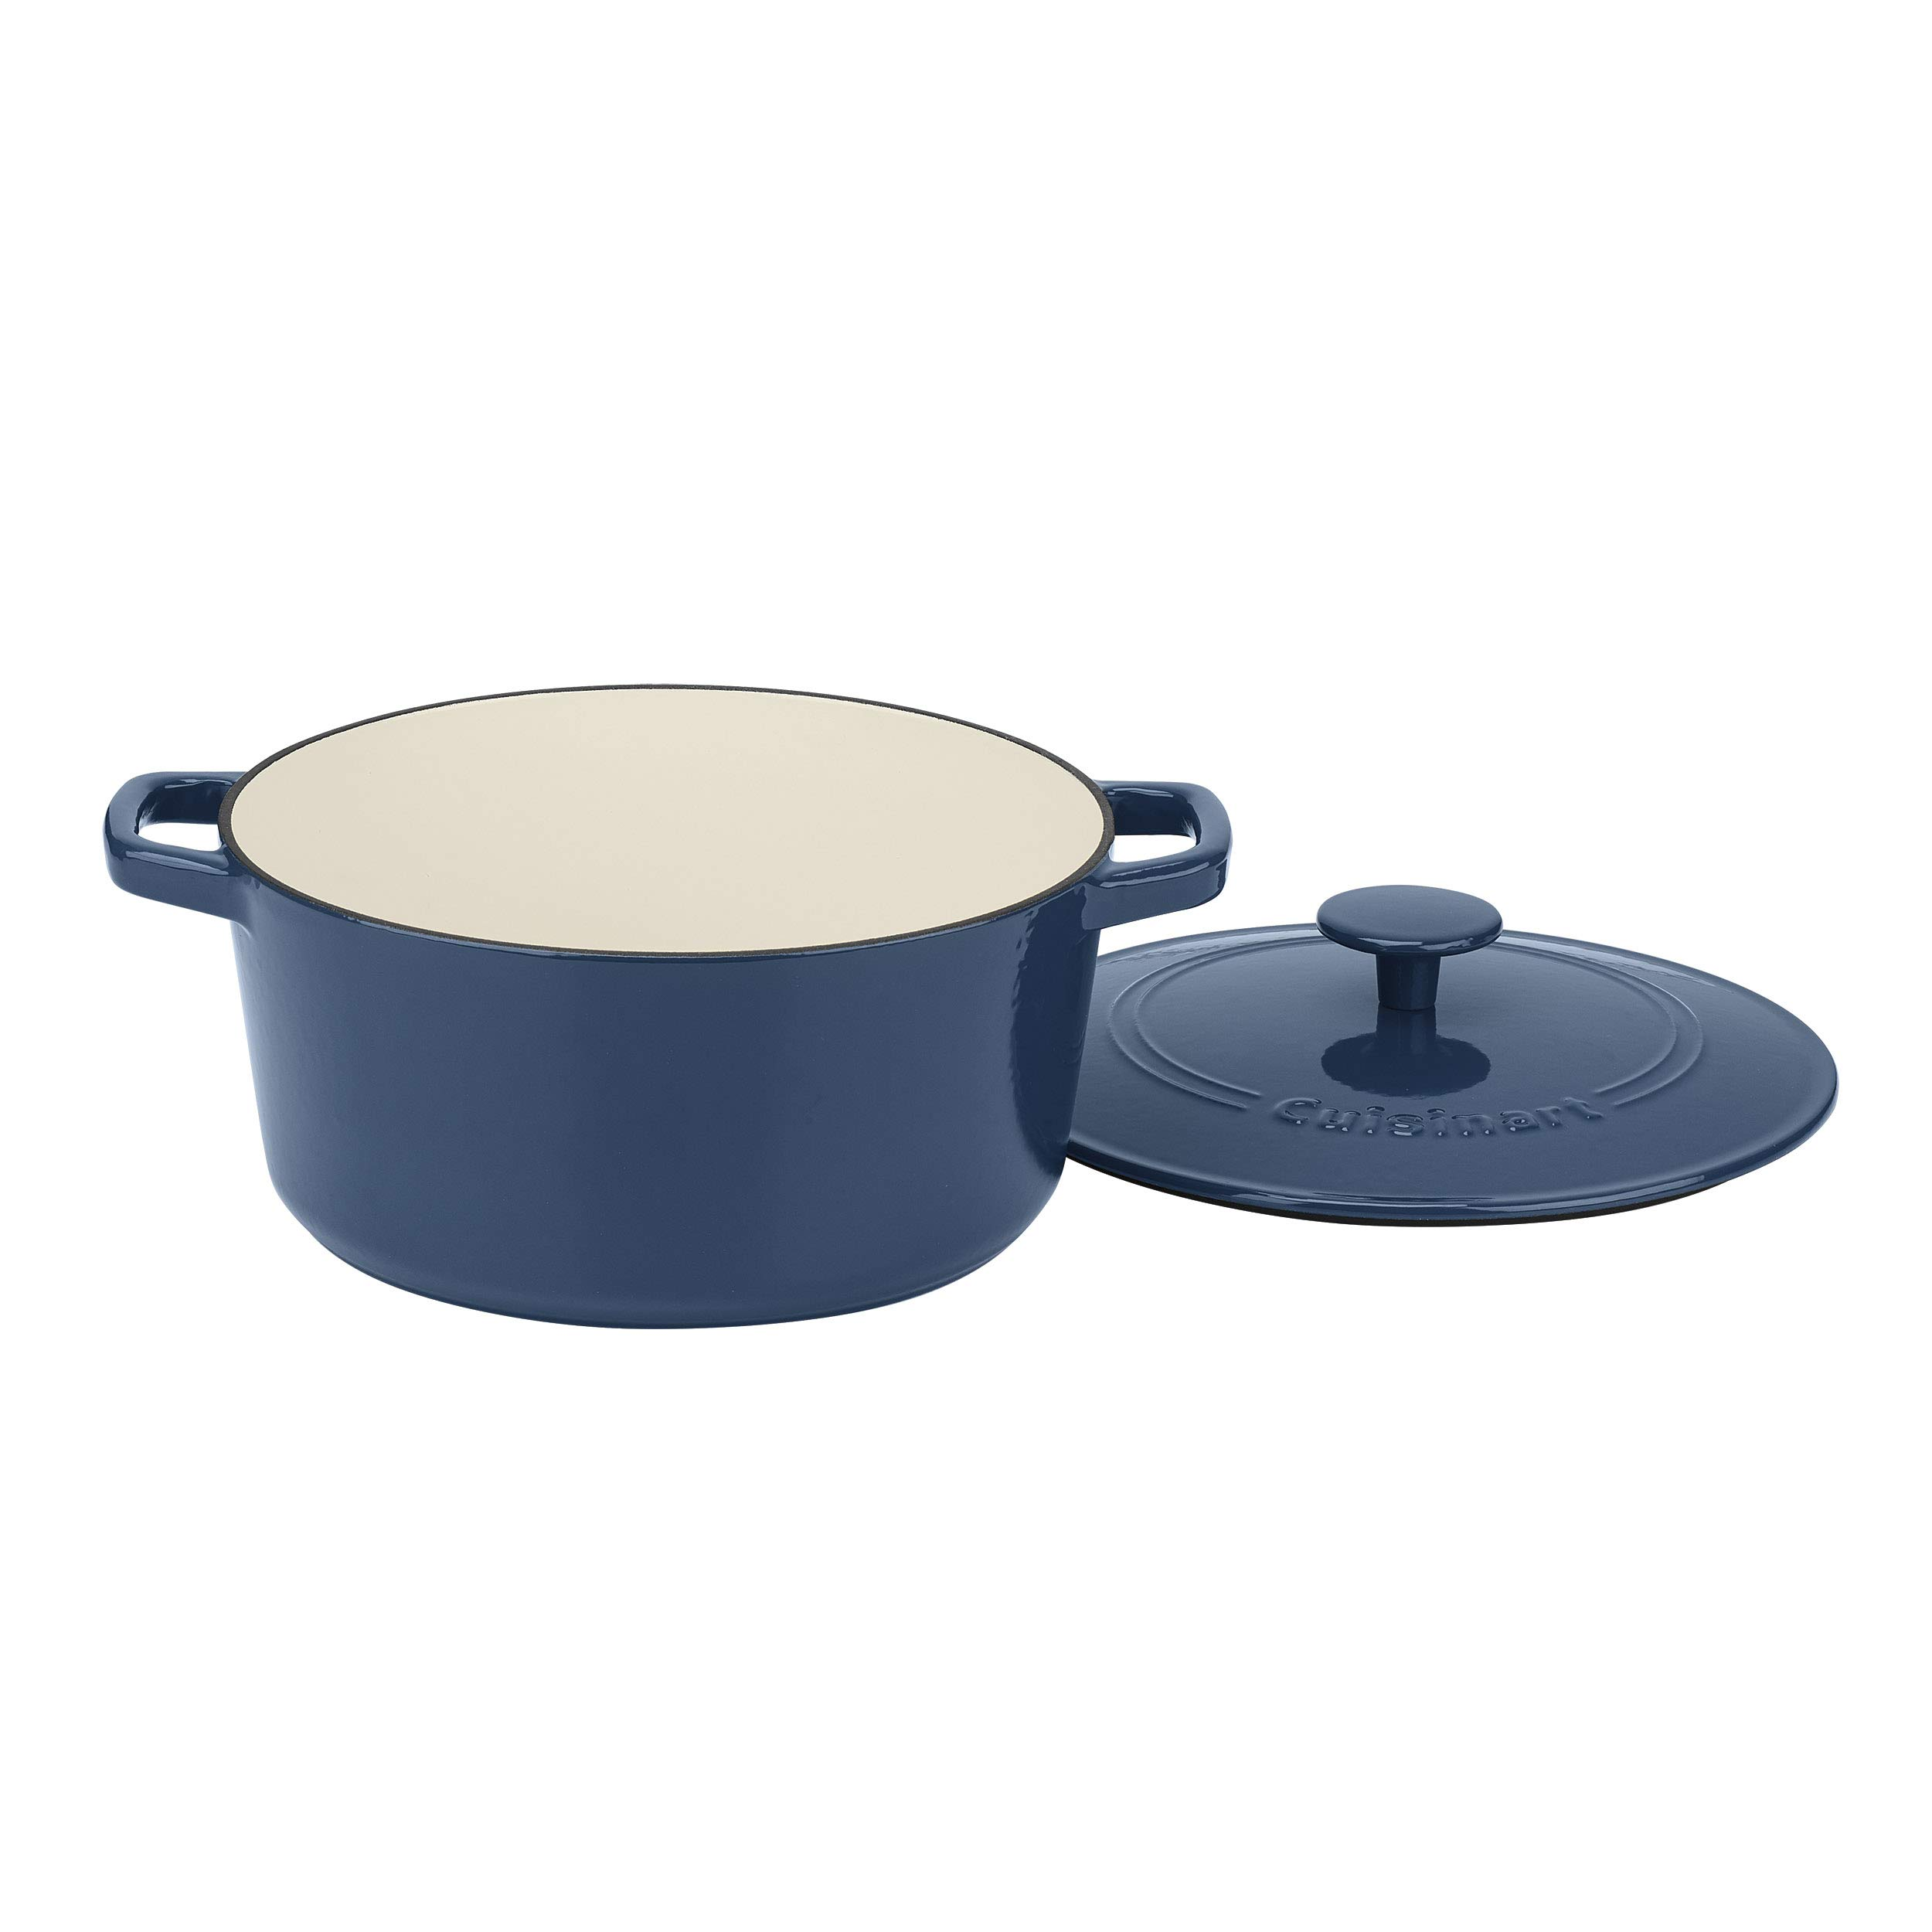 Cuisinart CI650-25BG 5 Qt Round Cast Iron Casserole Covered, Enameled Provencial Blue